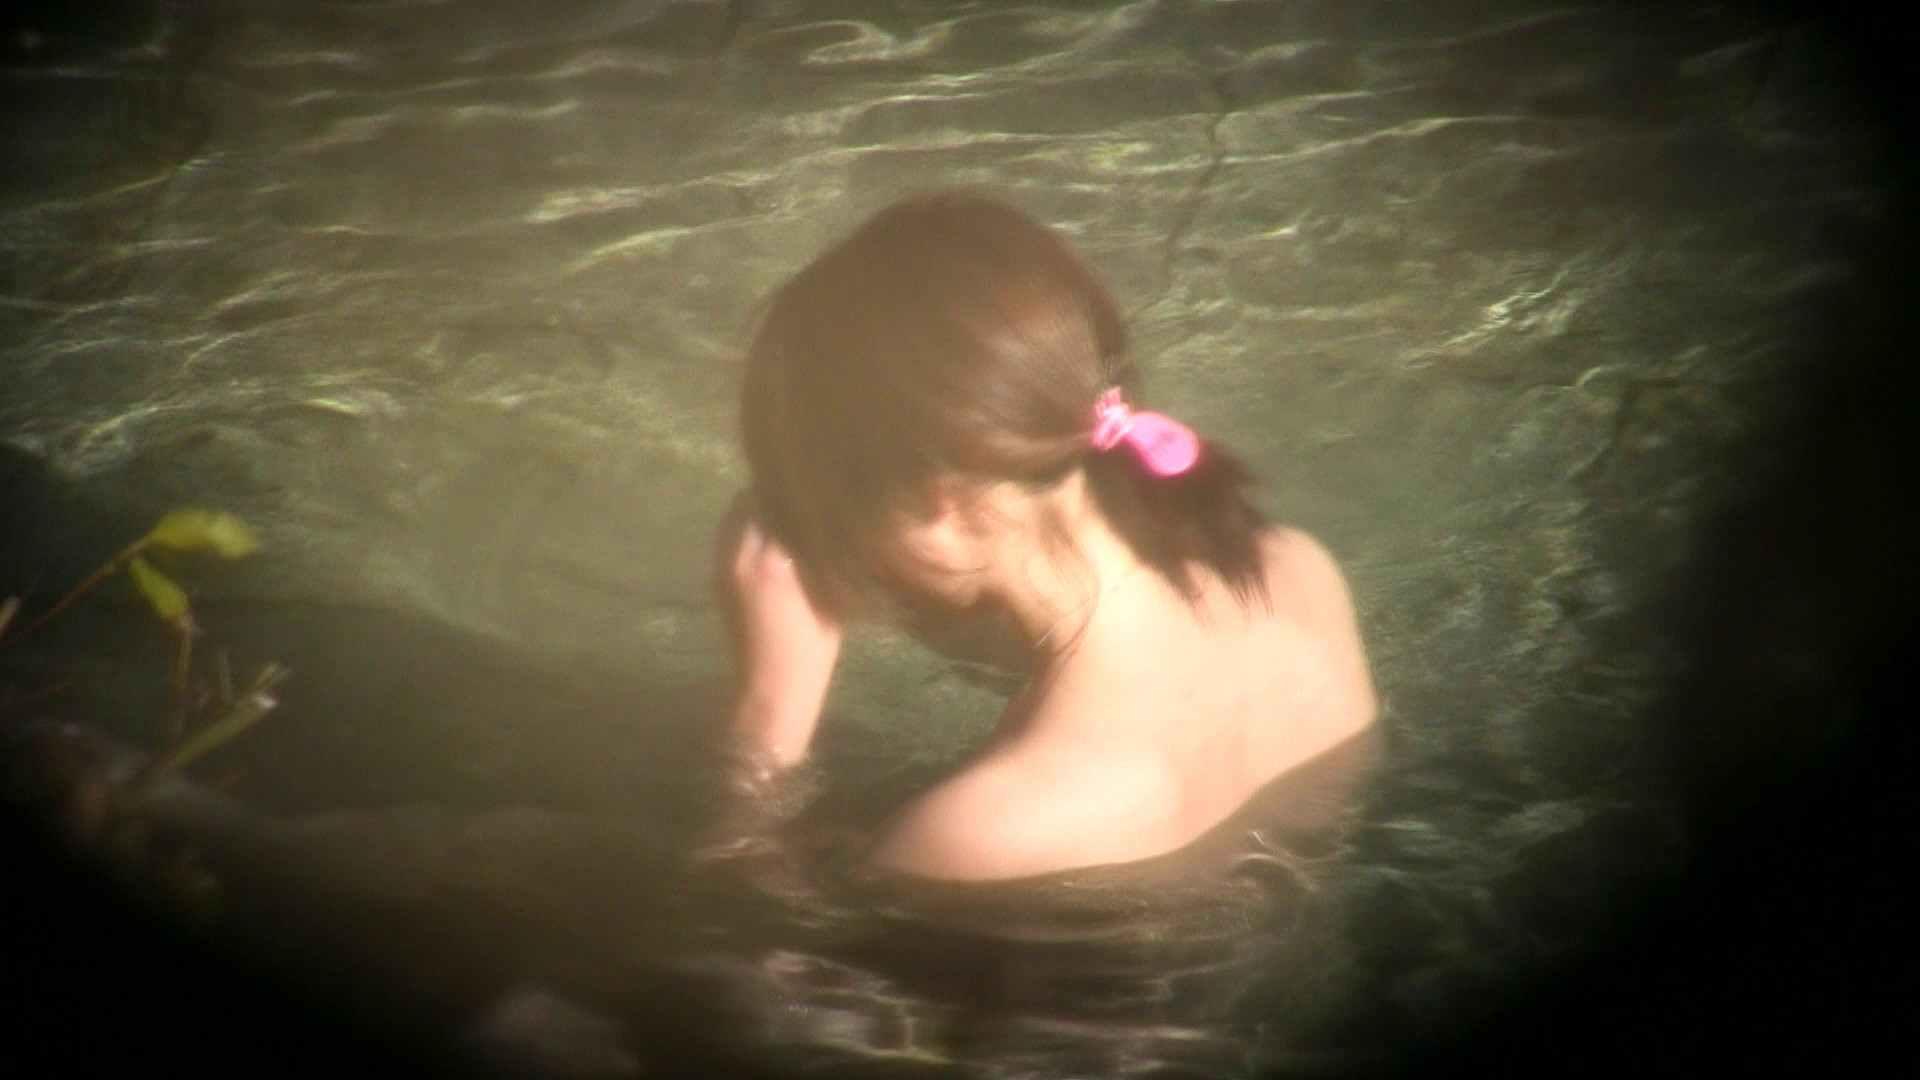 Aquaな露天風呂Vol.698 盗撮師作品  104pic 51